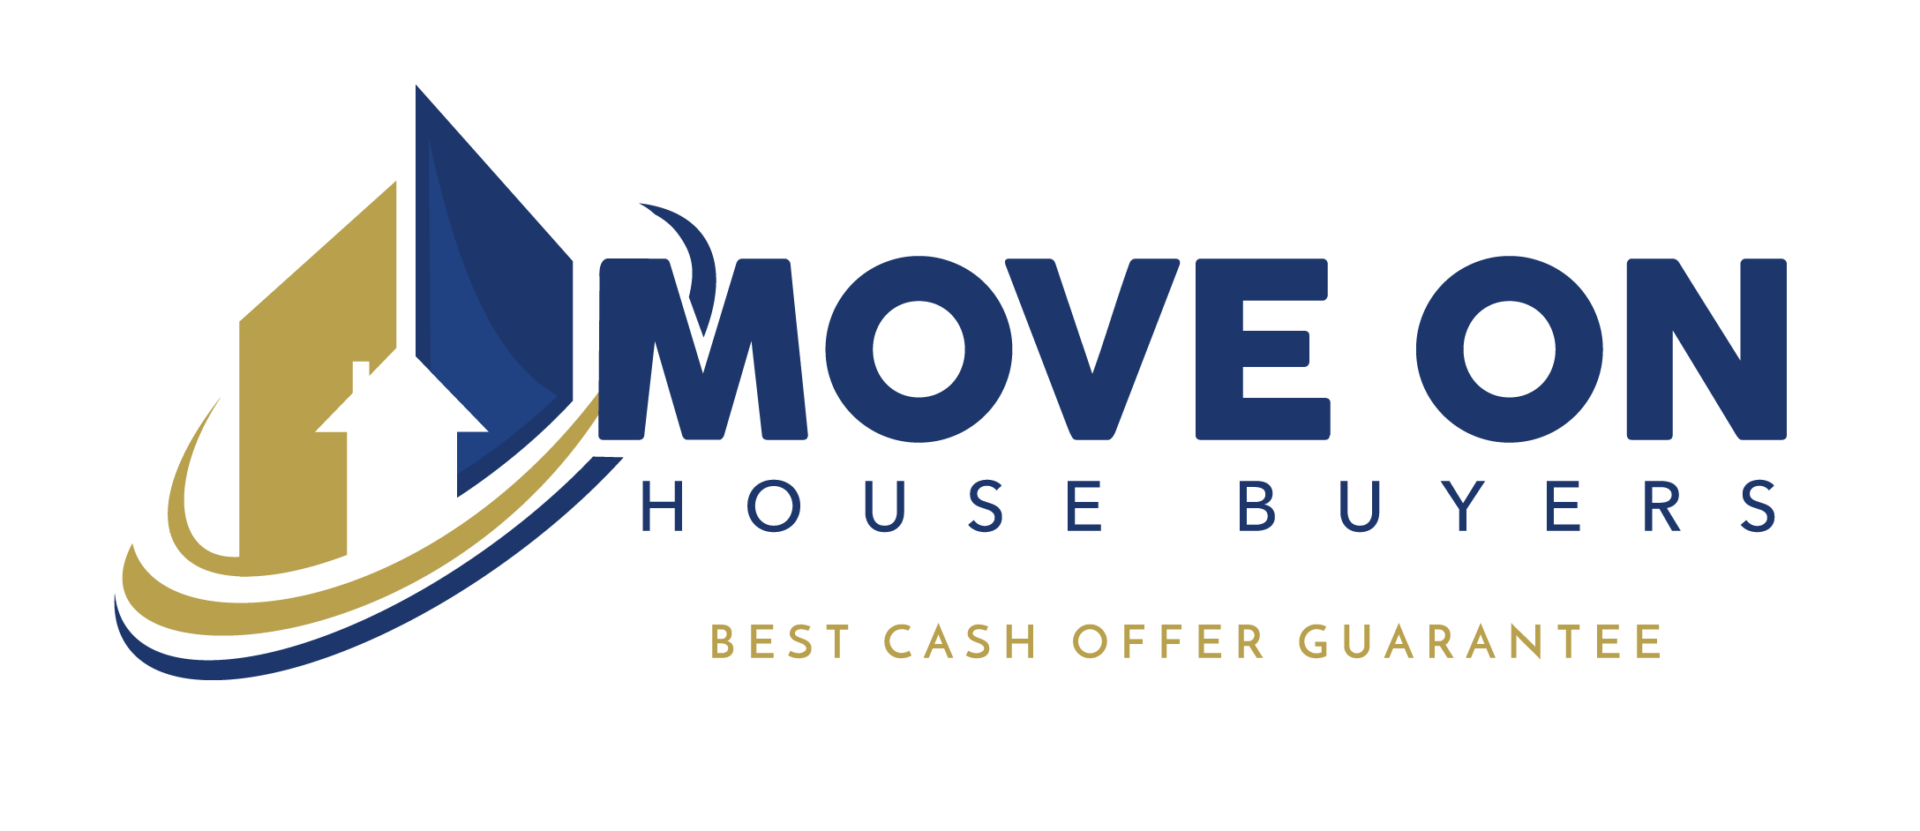 We Buy Houses Fast 100% Online – Best Cash Offer Guarantee logo